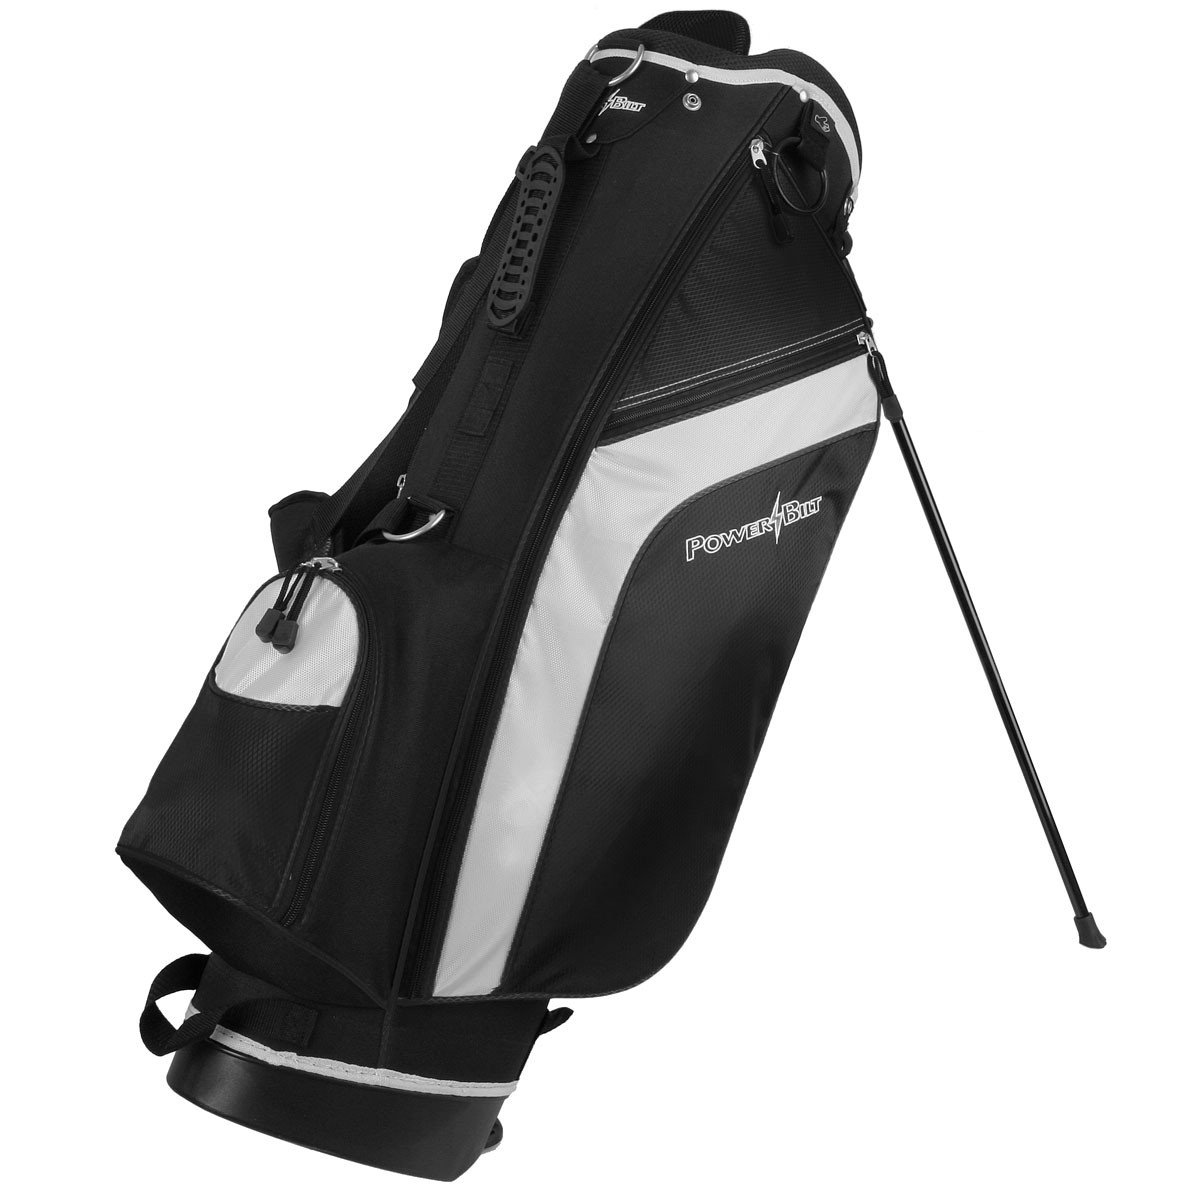 Powerbilt Santa Rosa Black/Black Stand Golf Bag (Black) by Powerbilt